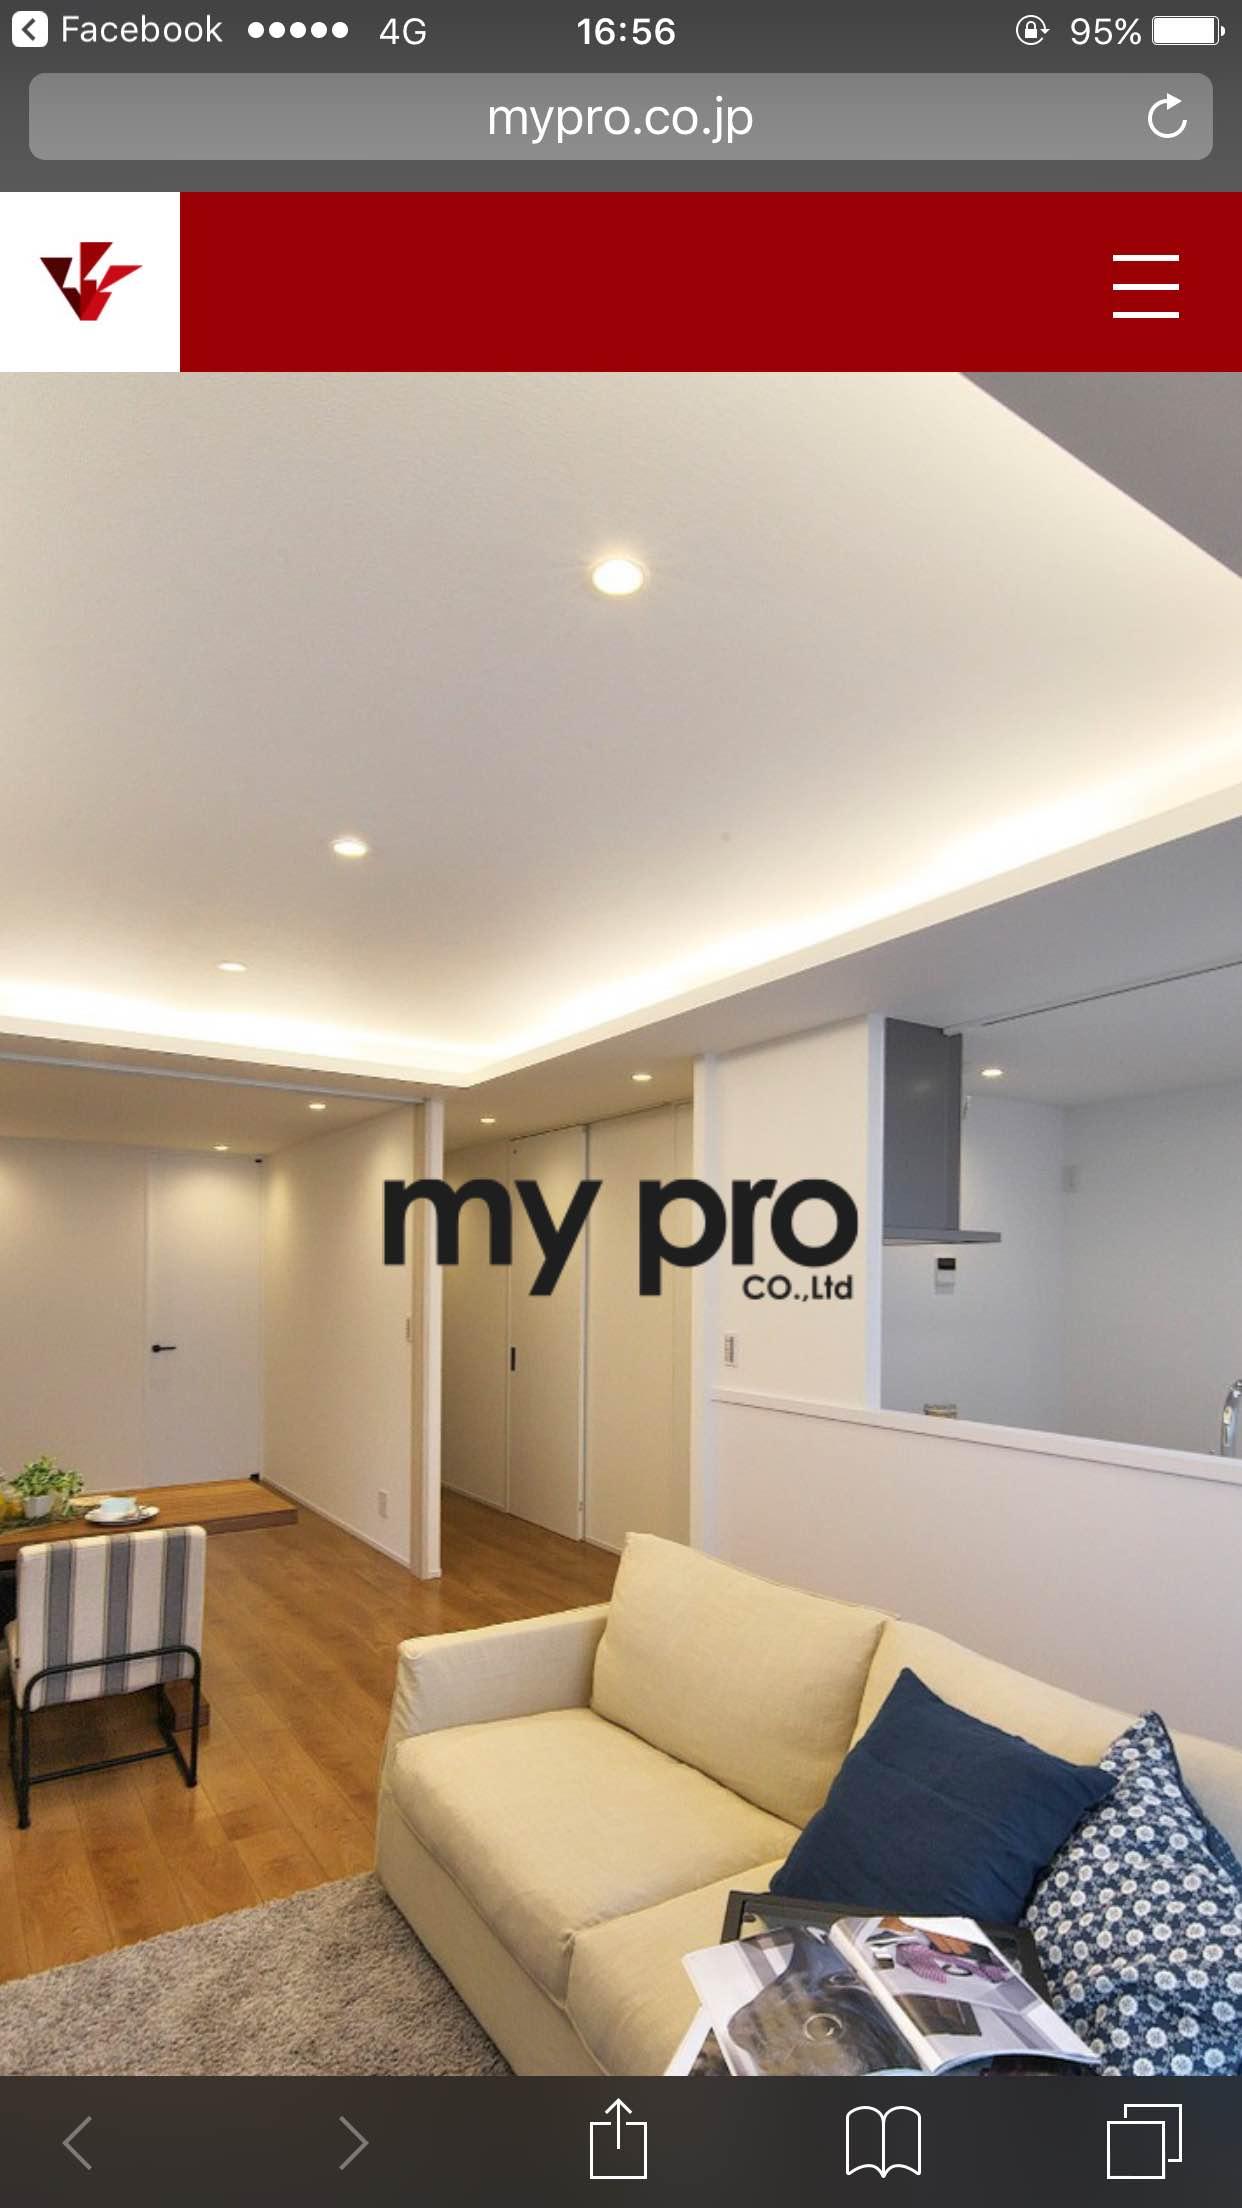 my pro - 名古屋の住宅資材販売はマイプロ